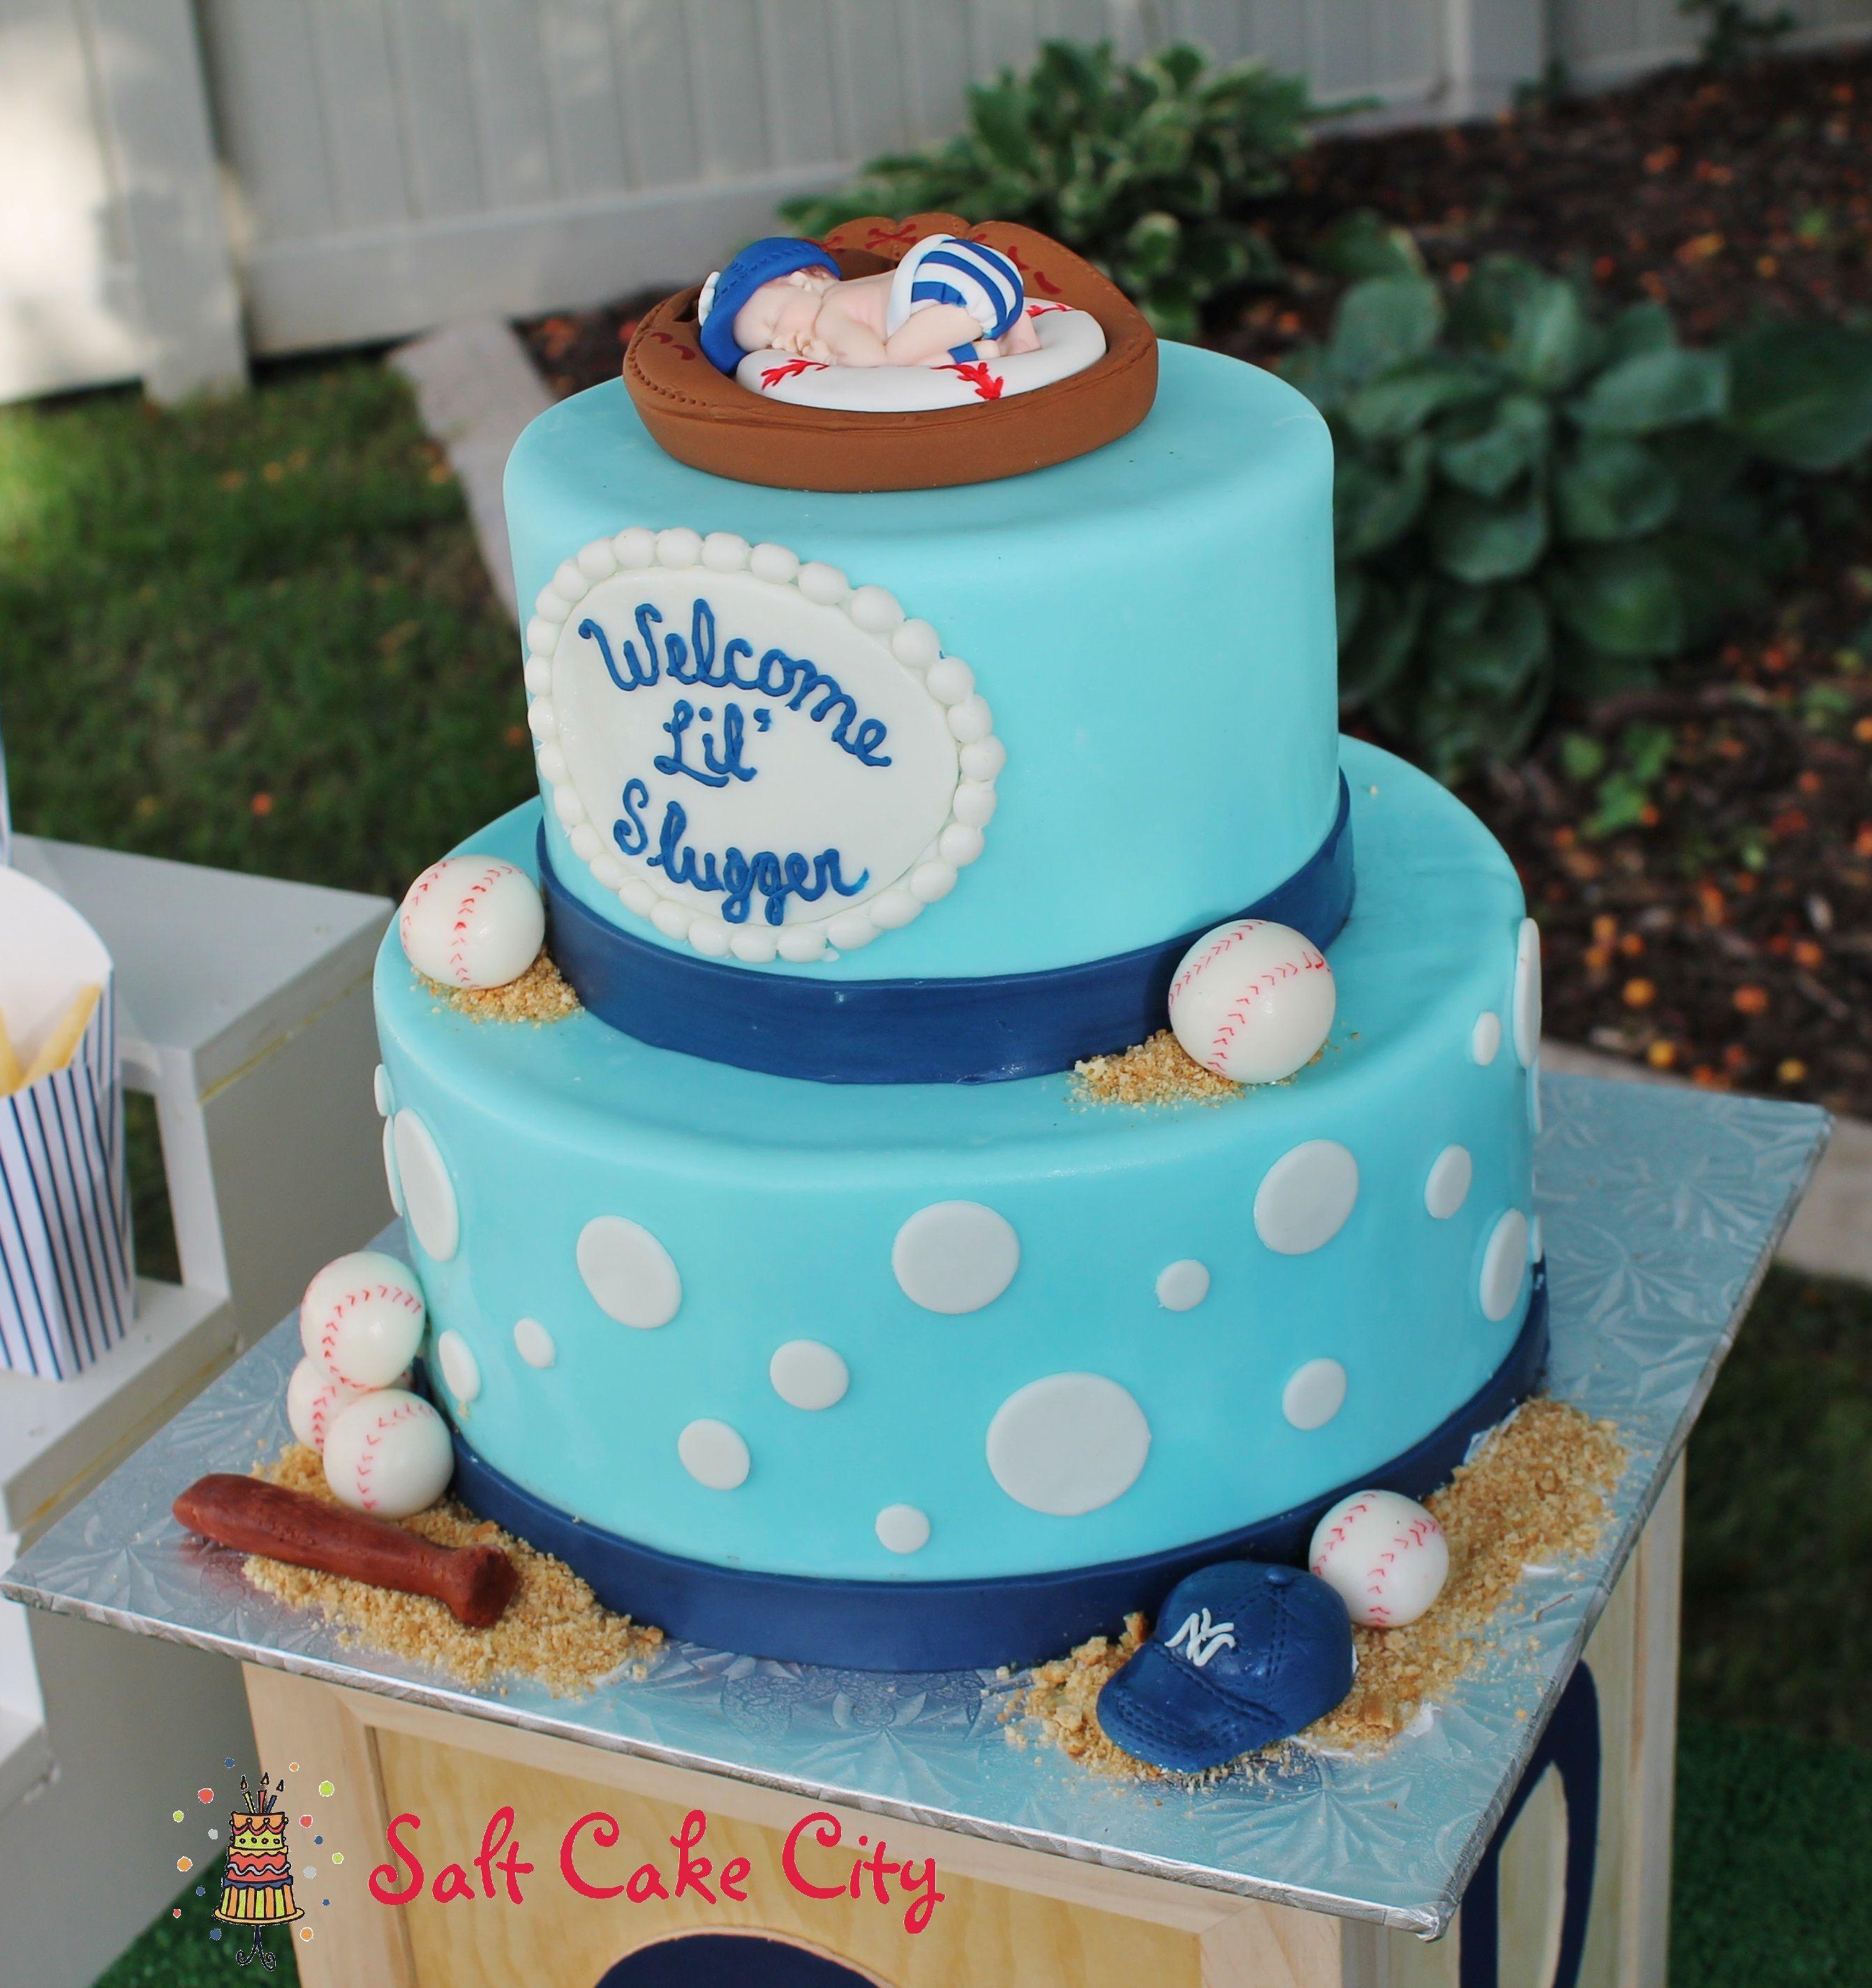 Cake ideas on pinterest pirate cakes marshmallow fondant and - Baseball Themed Baby Shower Cake Baby Blue Yankees Baby Shower Cake With Marshmallow Fondant Baseballs Hat And Ball